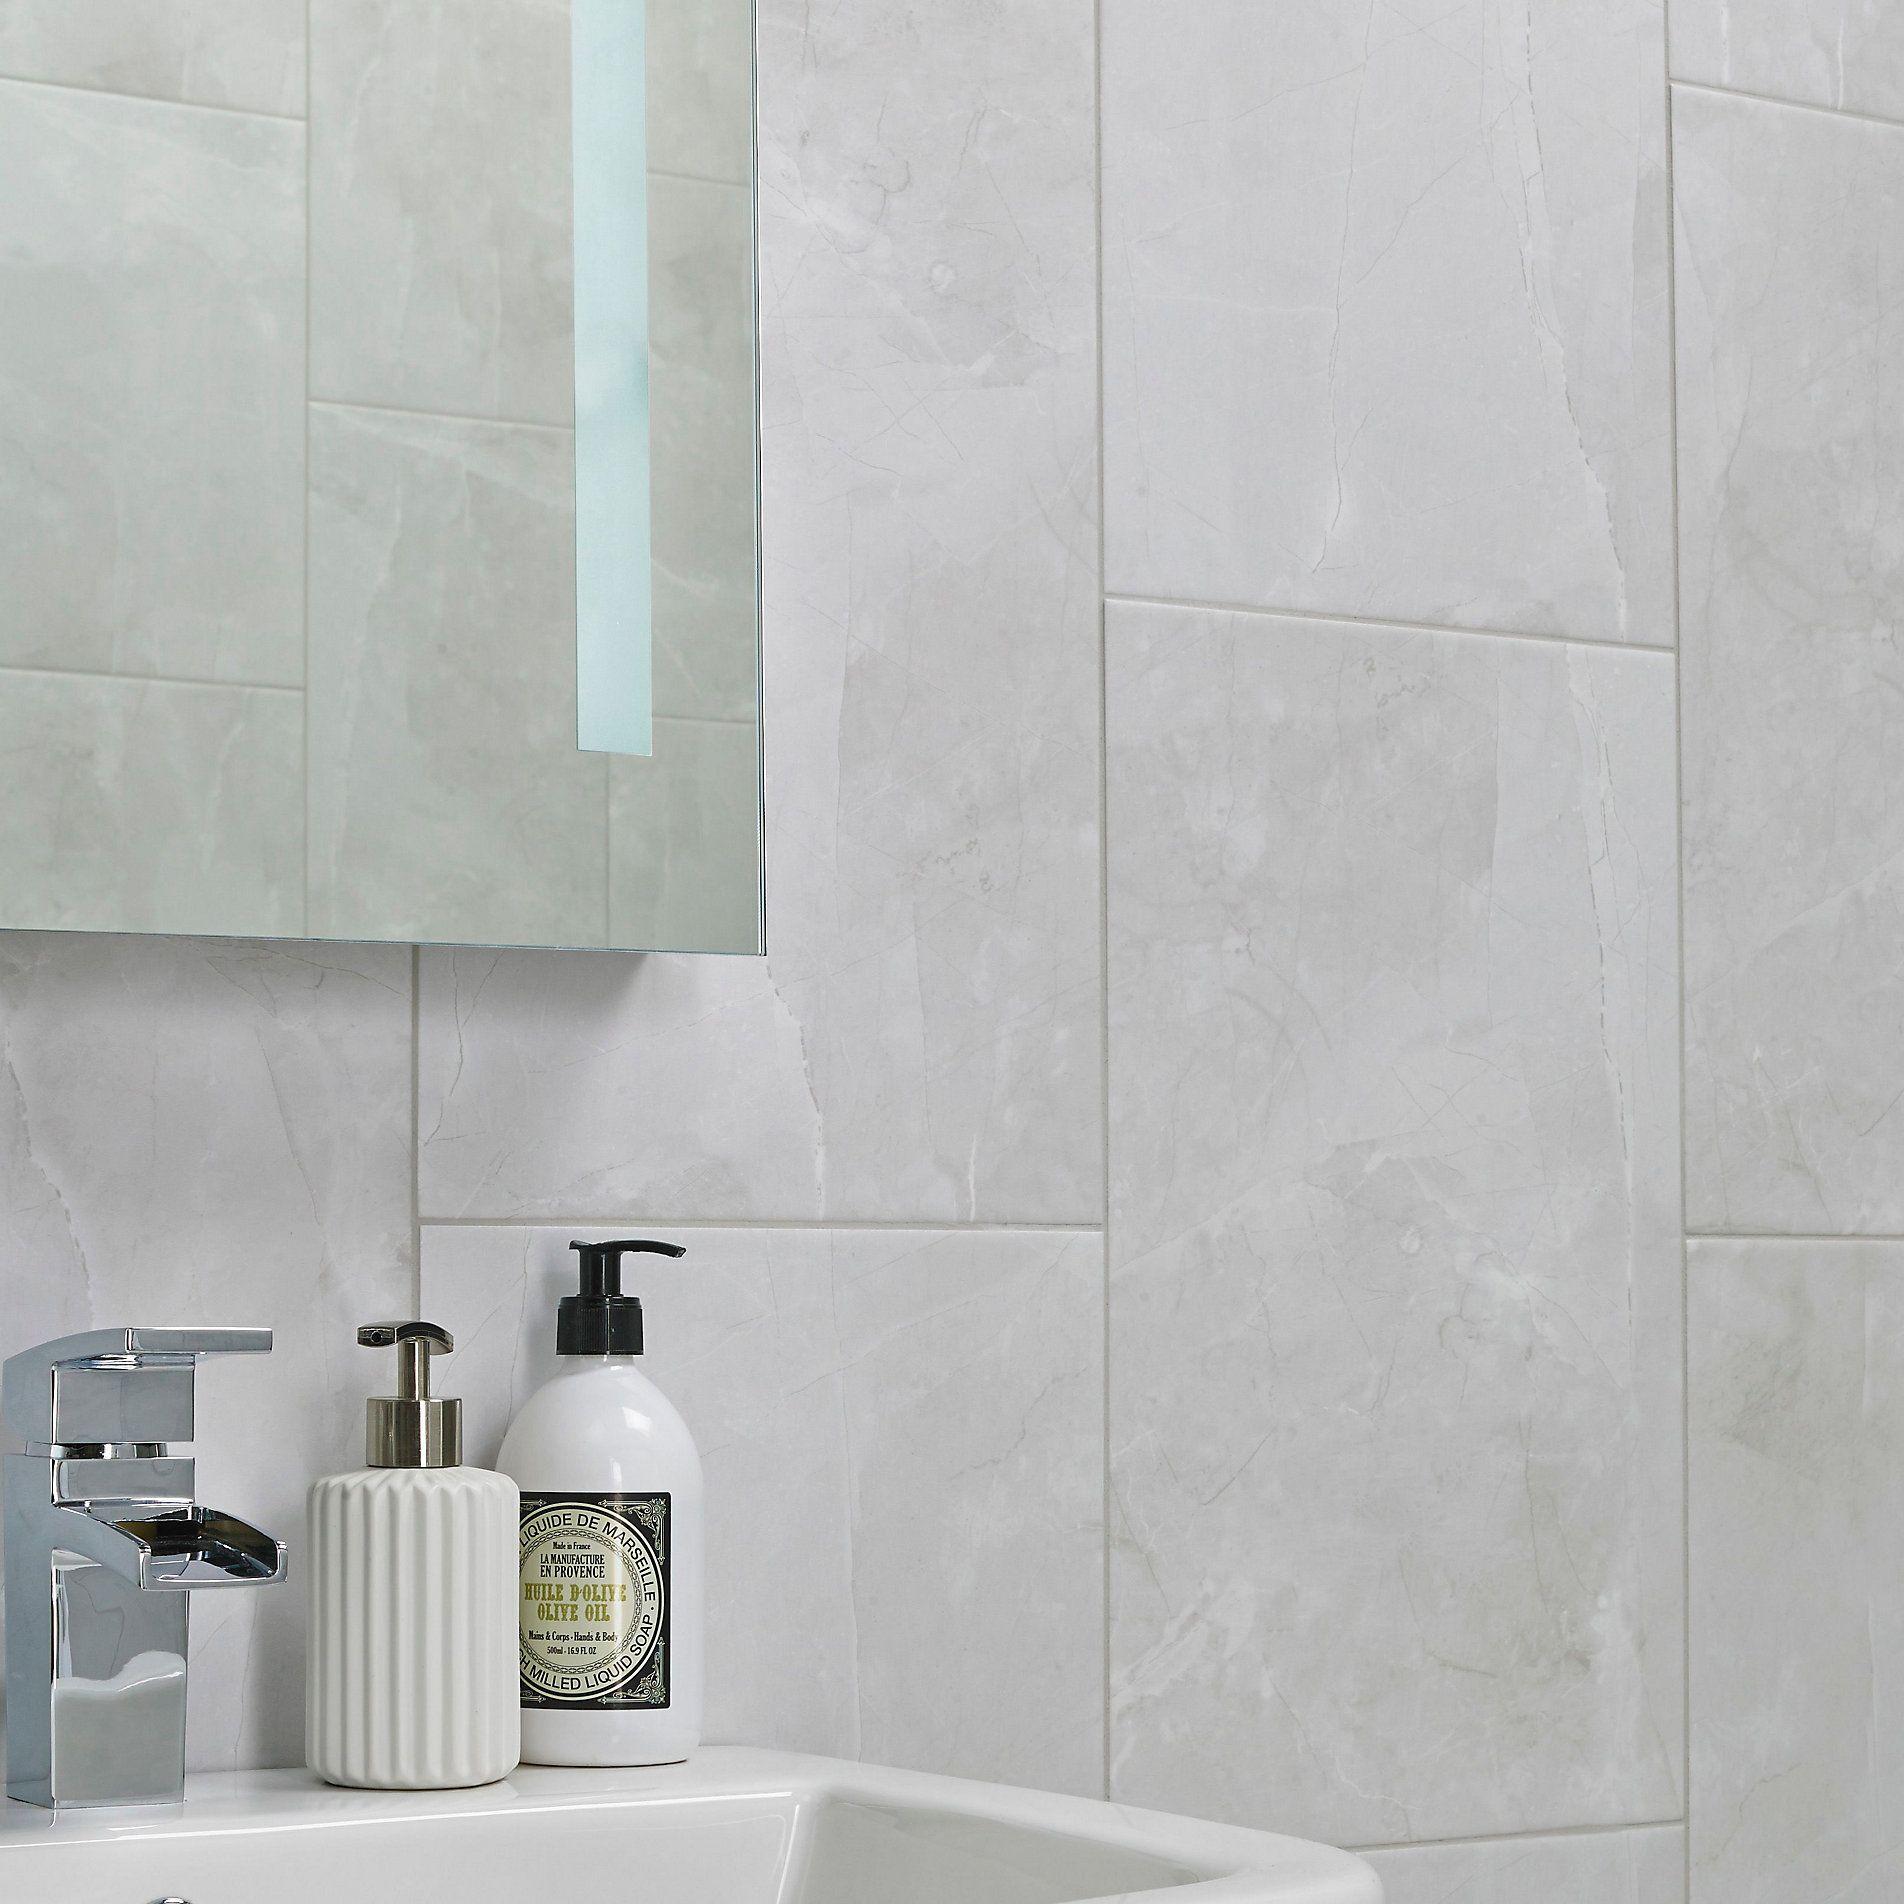 Arlington Marble Mist Stone Effect High Definition Ceramic Wall Floor Tile Pack Of 6 L 4 Bathroom Wall Panels Marble Shower Walls Grey Bathroom Wall Tiles